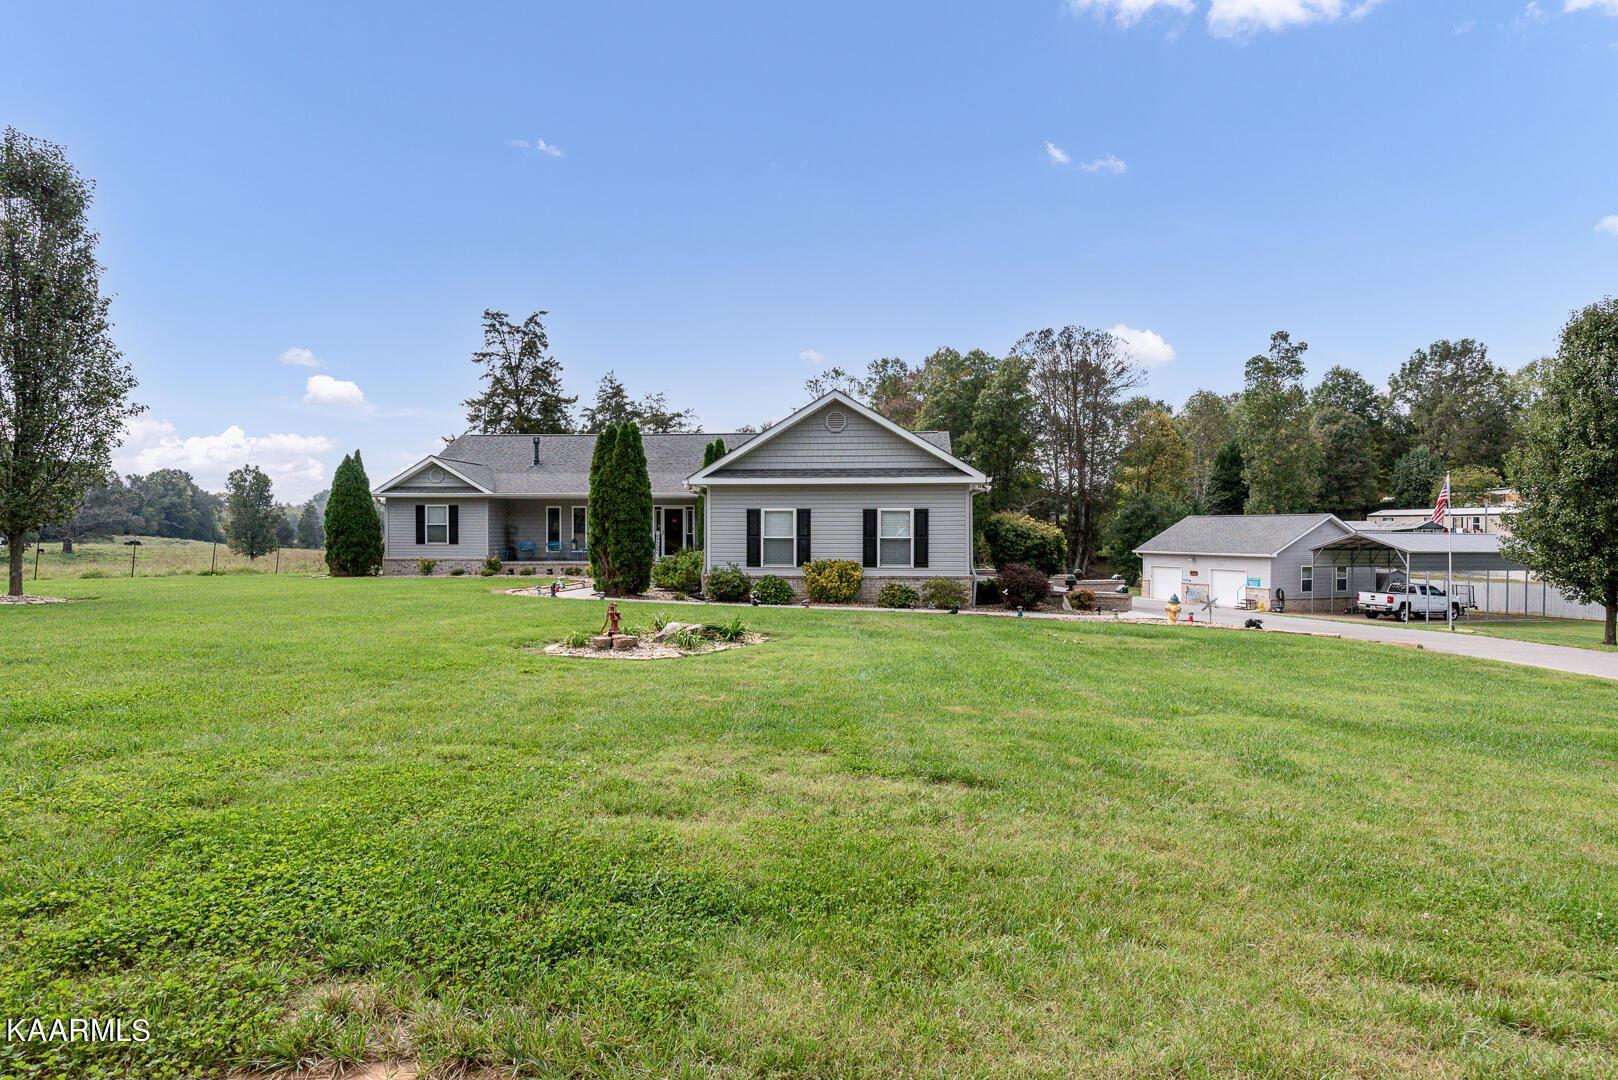 Photo of 128 Temple Rd, Maryville, TN 37804 (MLS # 1171819)